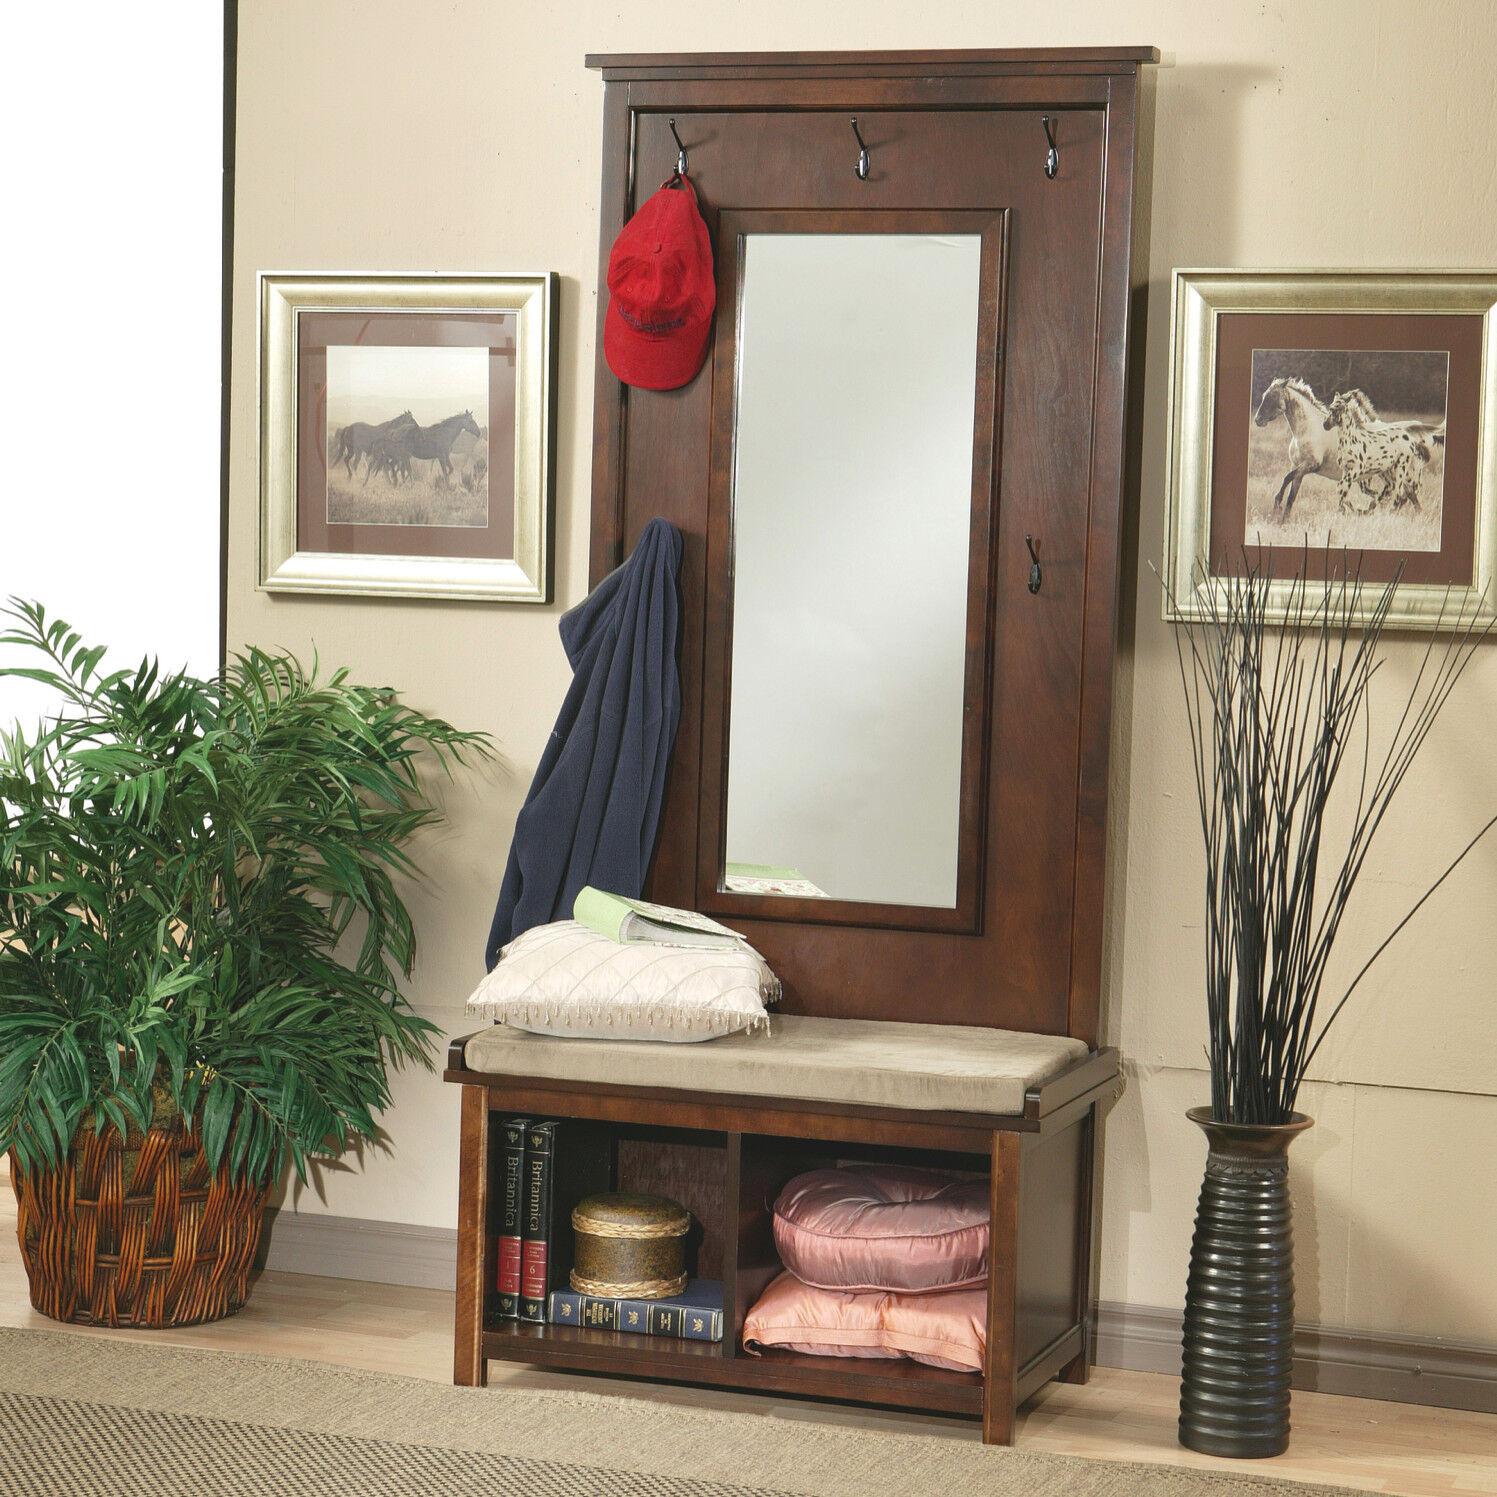 Brown greenical Mirror Hall Tree Storage Bench Entryway Furniture